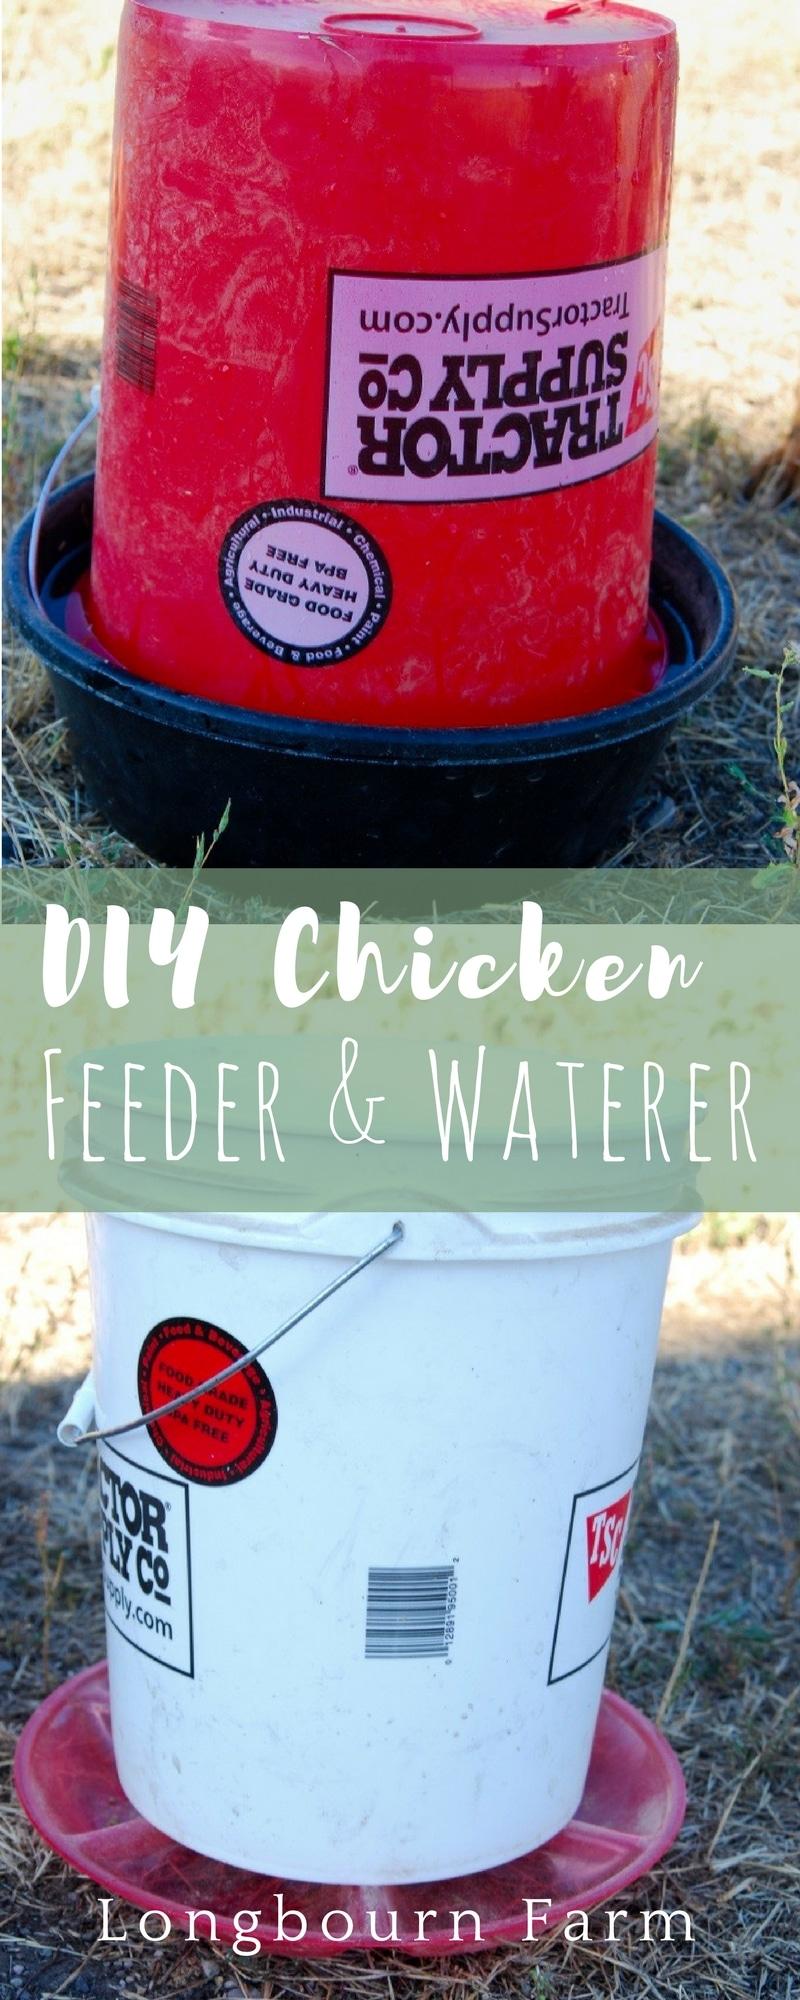 Chicken Feeder And Waterer A Tutorial